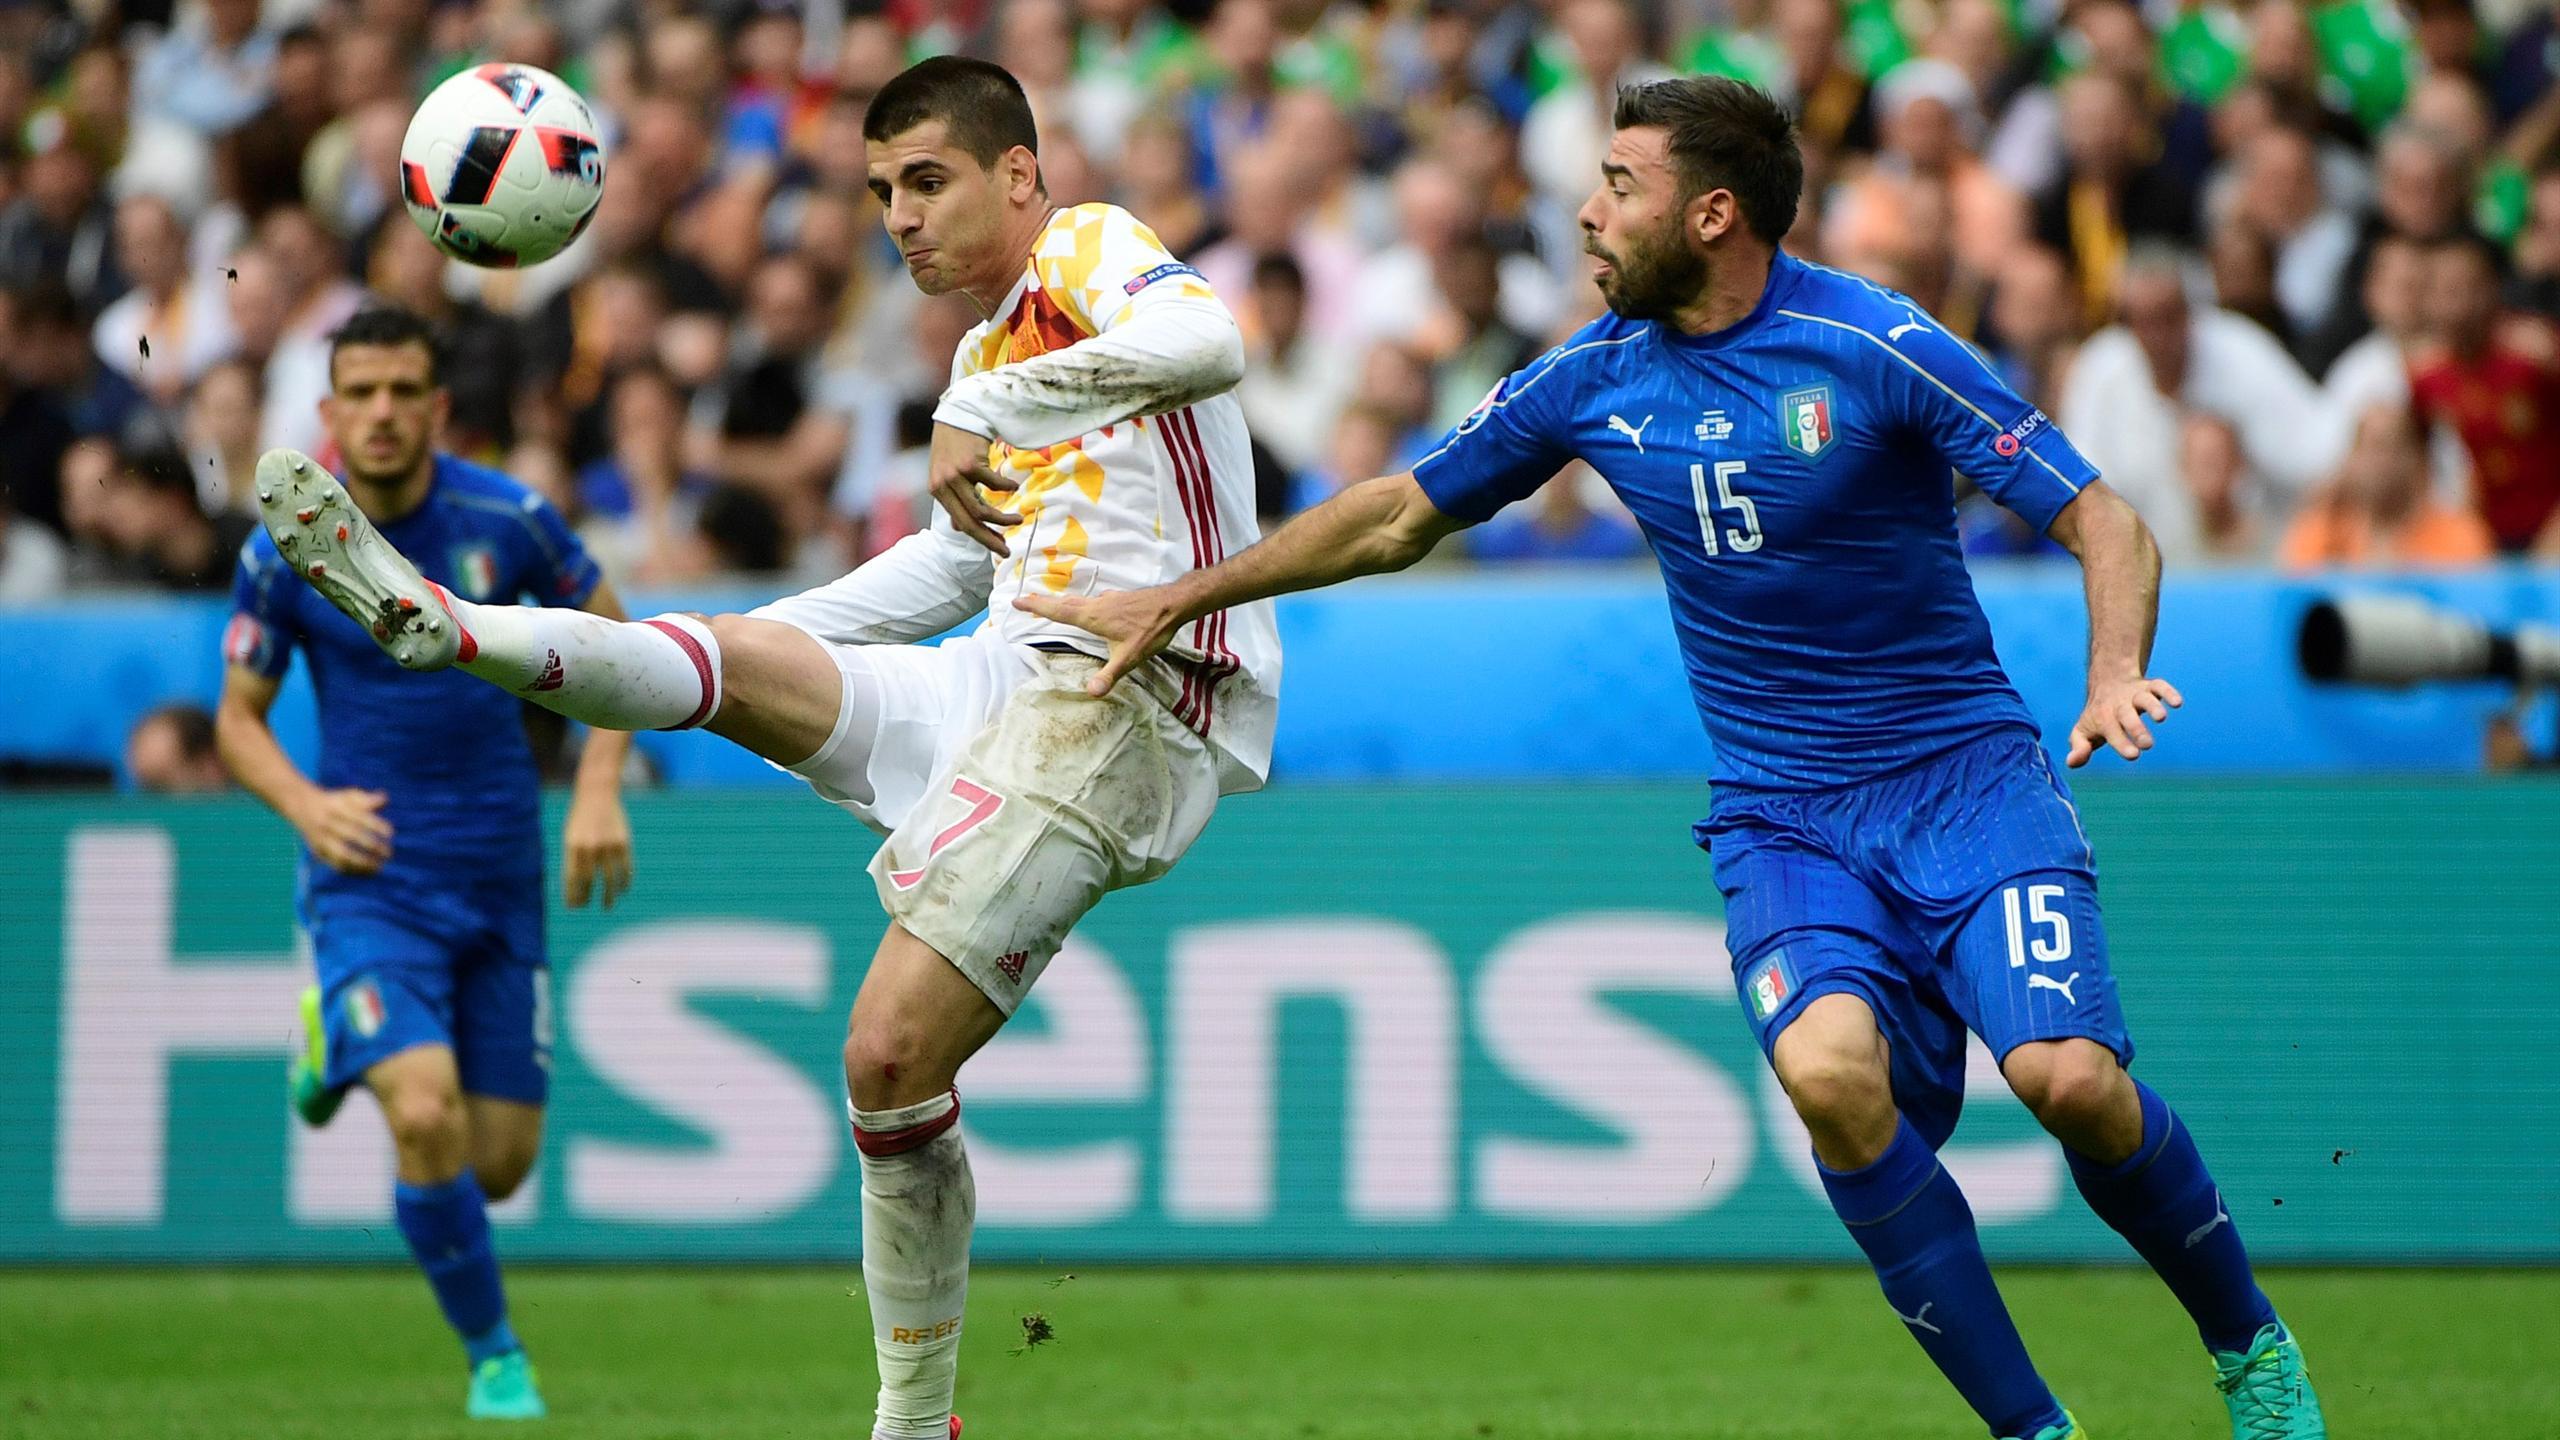 Morata, Barzagli - Italy v Spain - Euro 2016